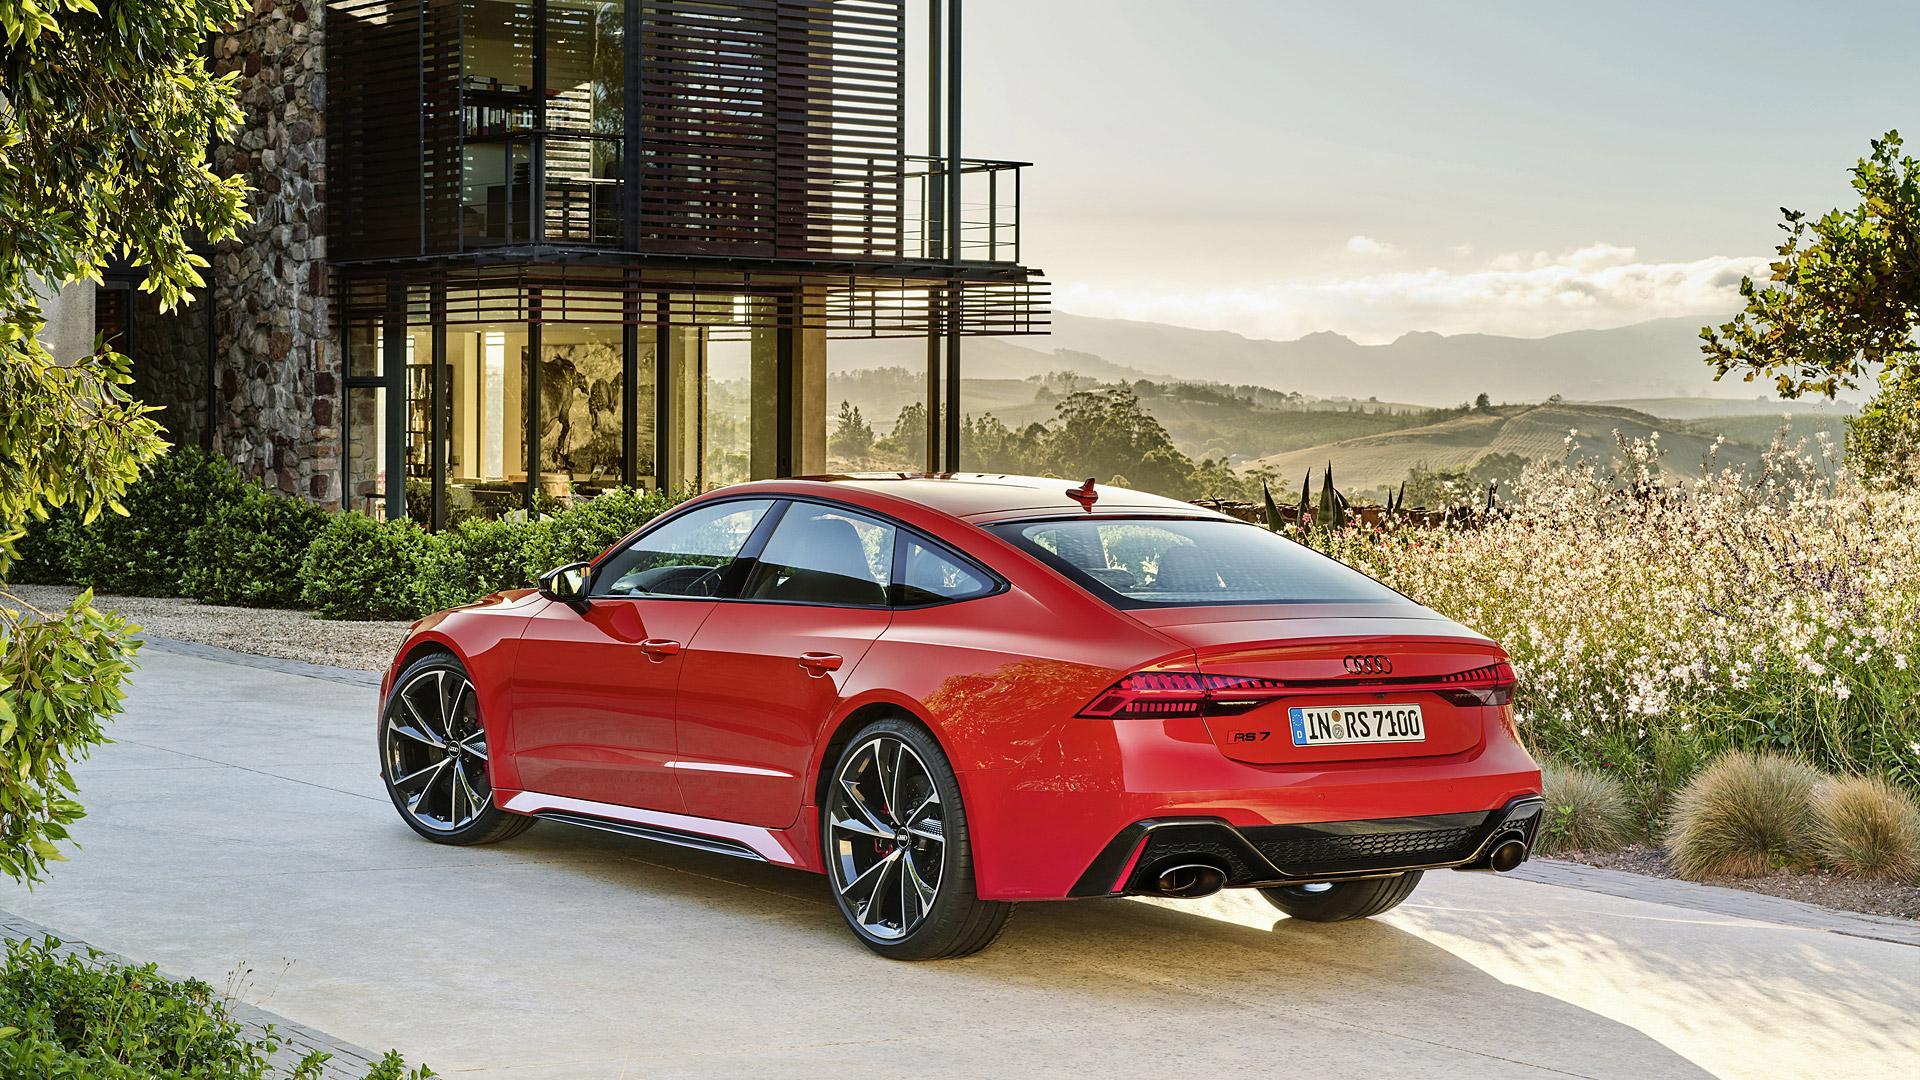 Audi Rs7 2020 Wallpapers - Wallpaper Cave